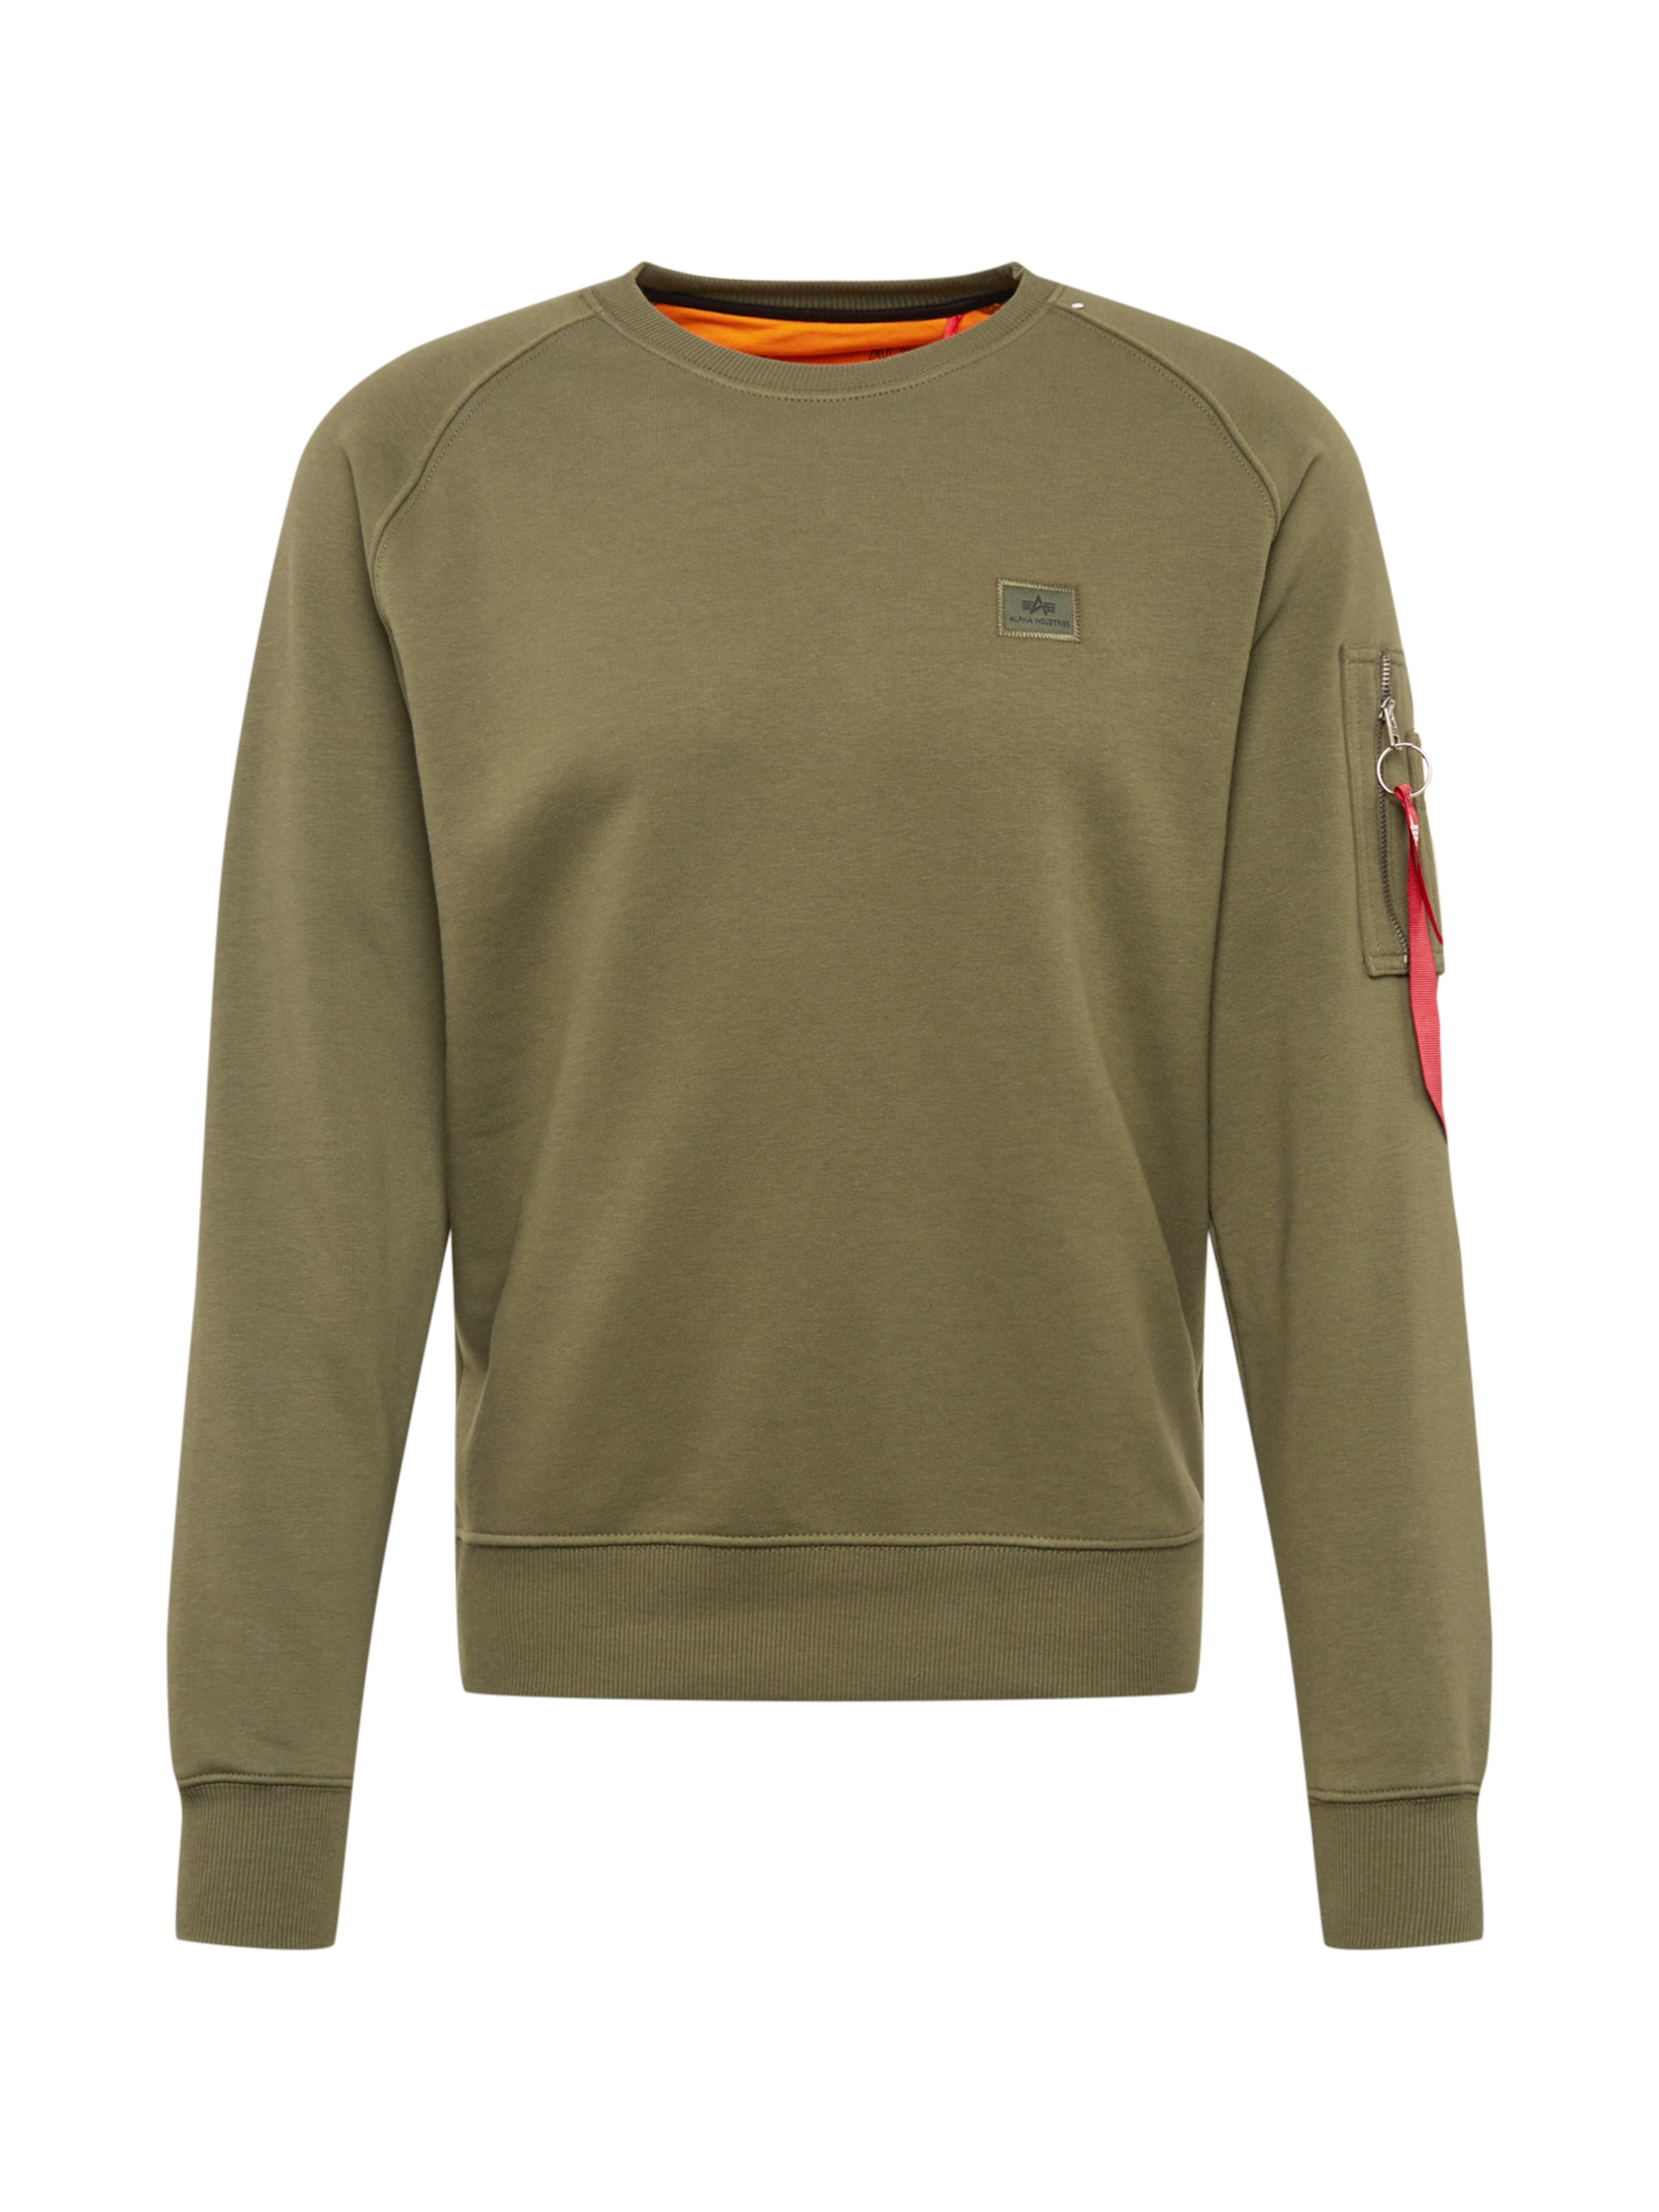 Industries En Alpha Sweat shirt Noir ARj345L